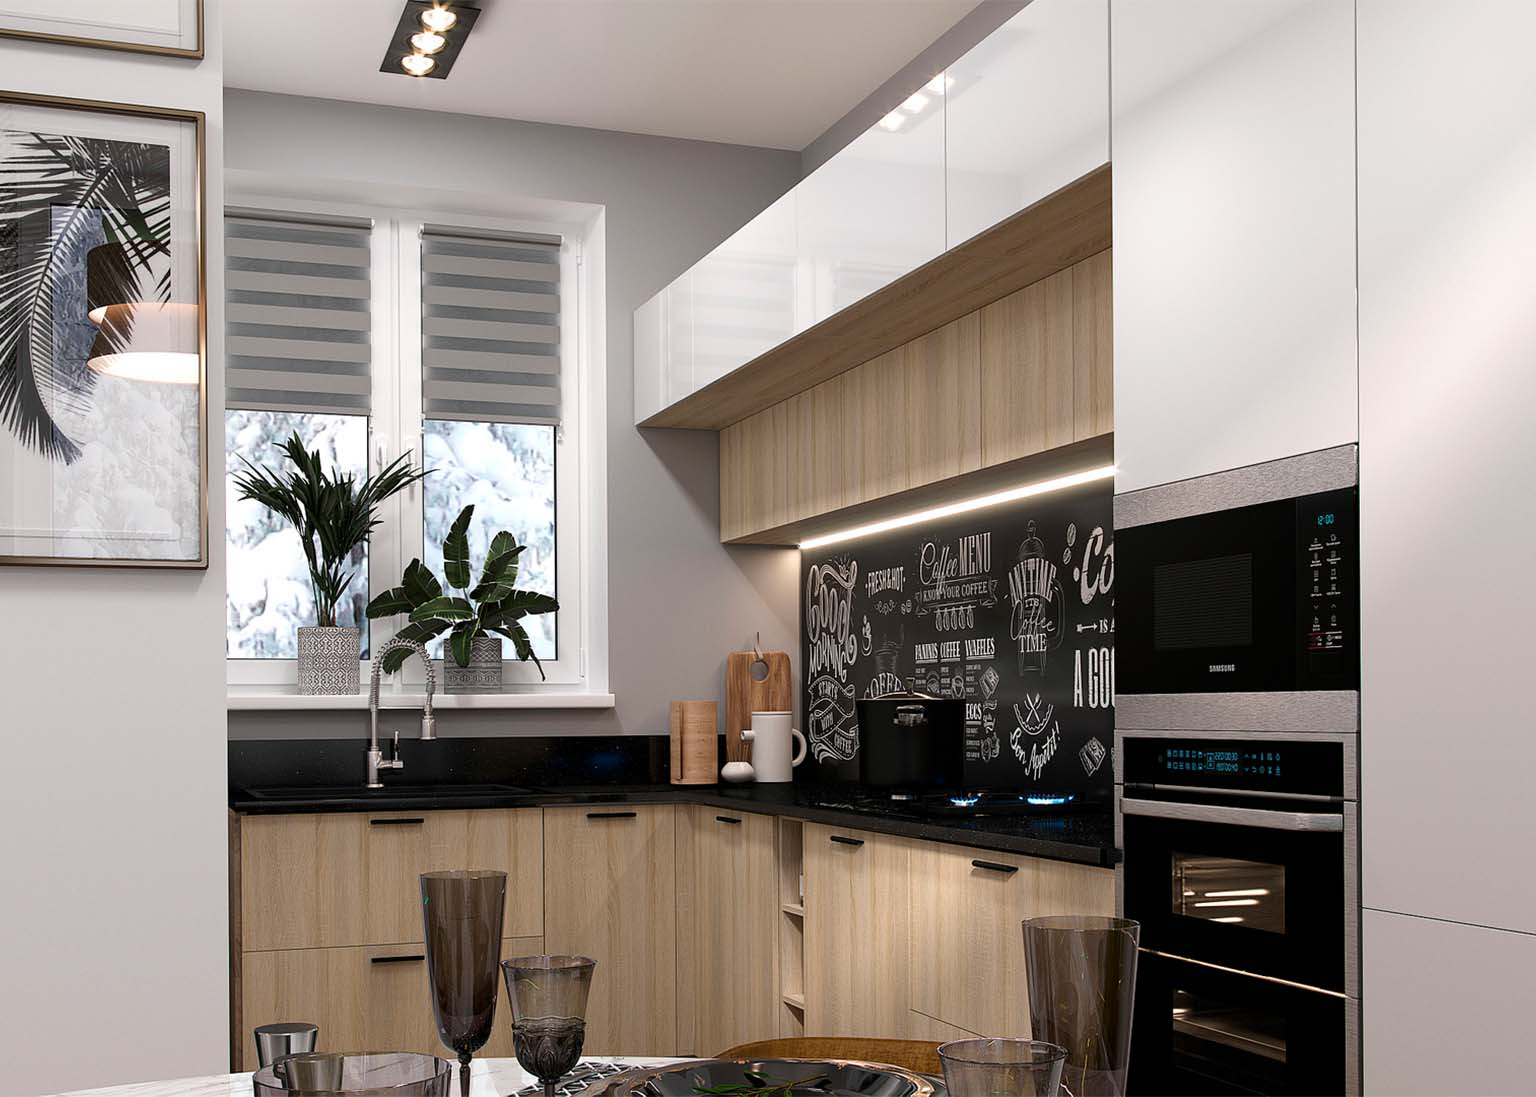 Кухня Модерн NEW Белый глянец Кухня Модус Дуб Сонома SV-Мебель